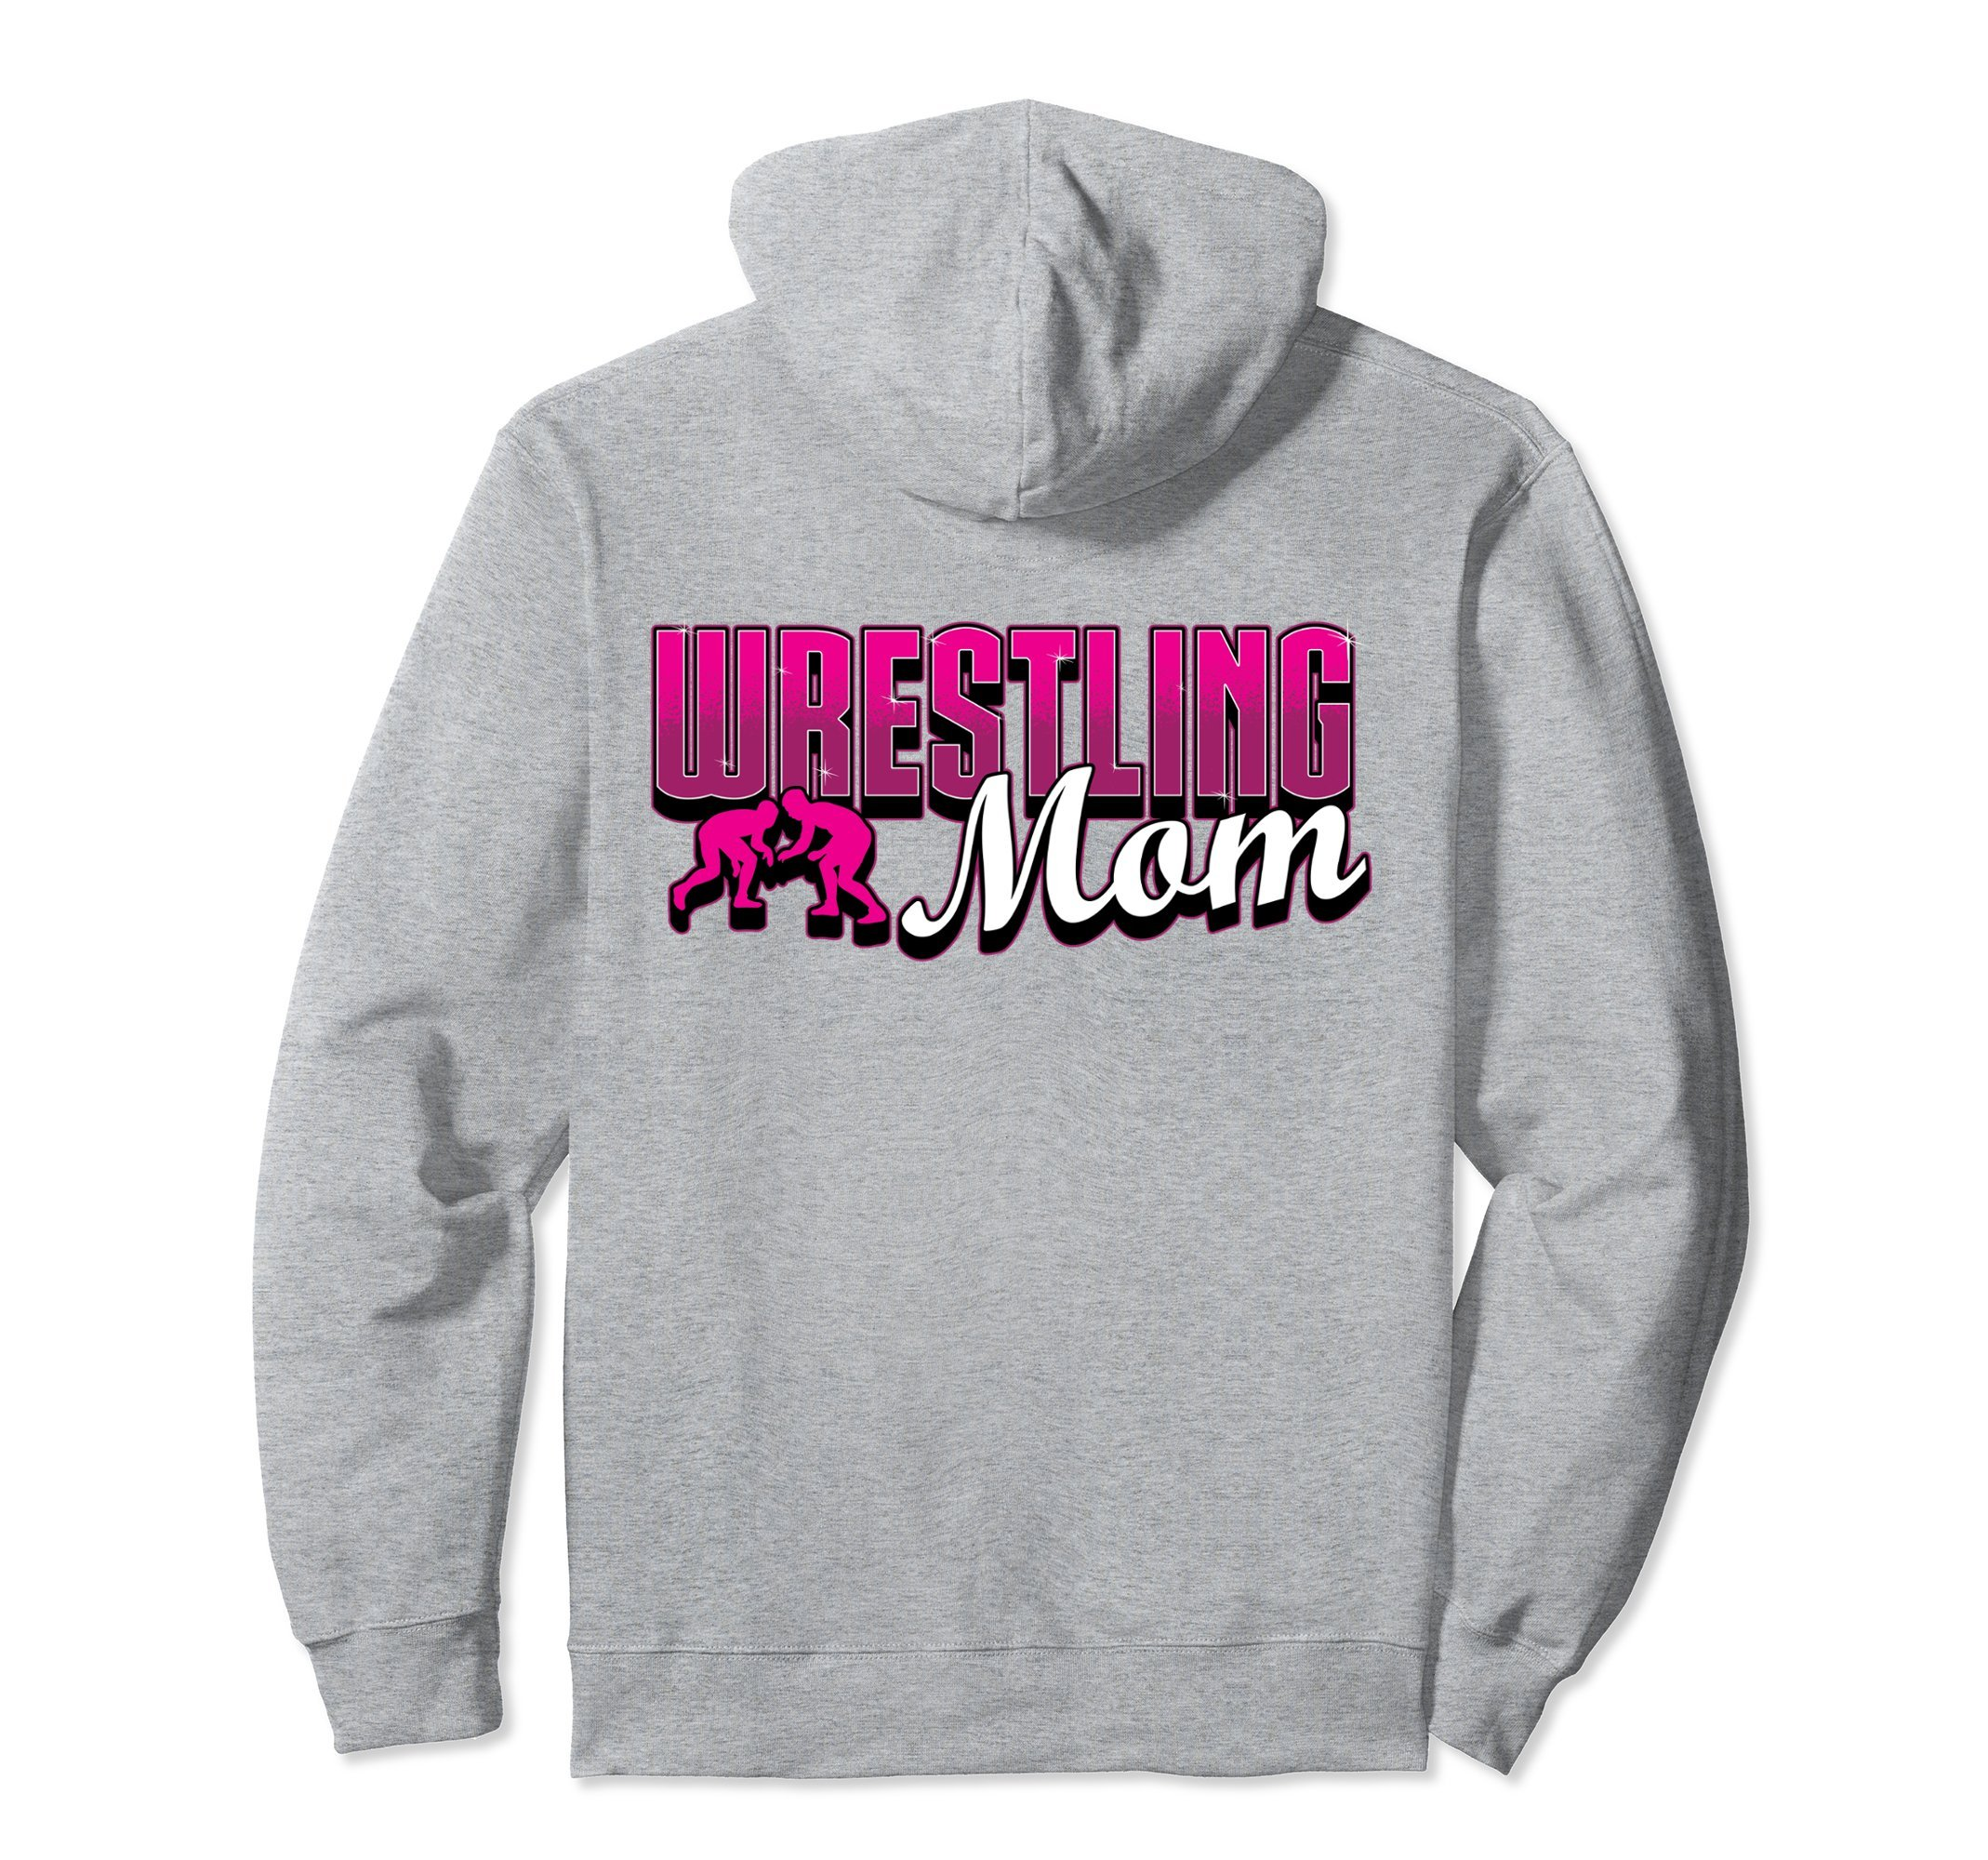 Unisex Wrestling Hoodie - Wrestling Mom Sweatshirt Small Heather Grey